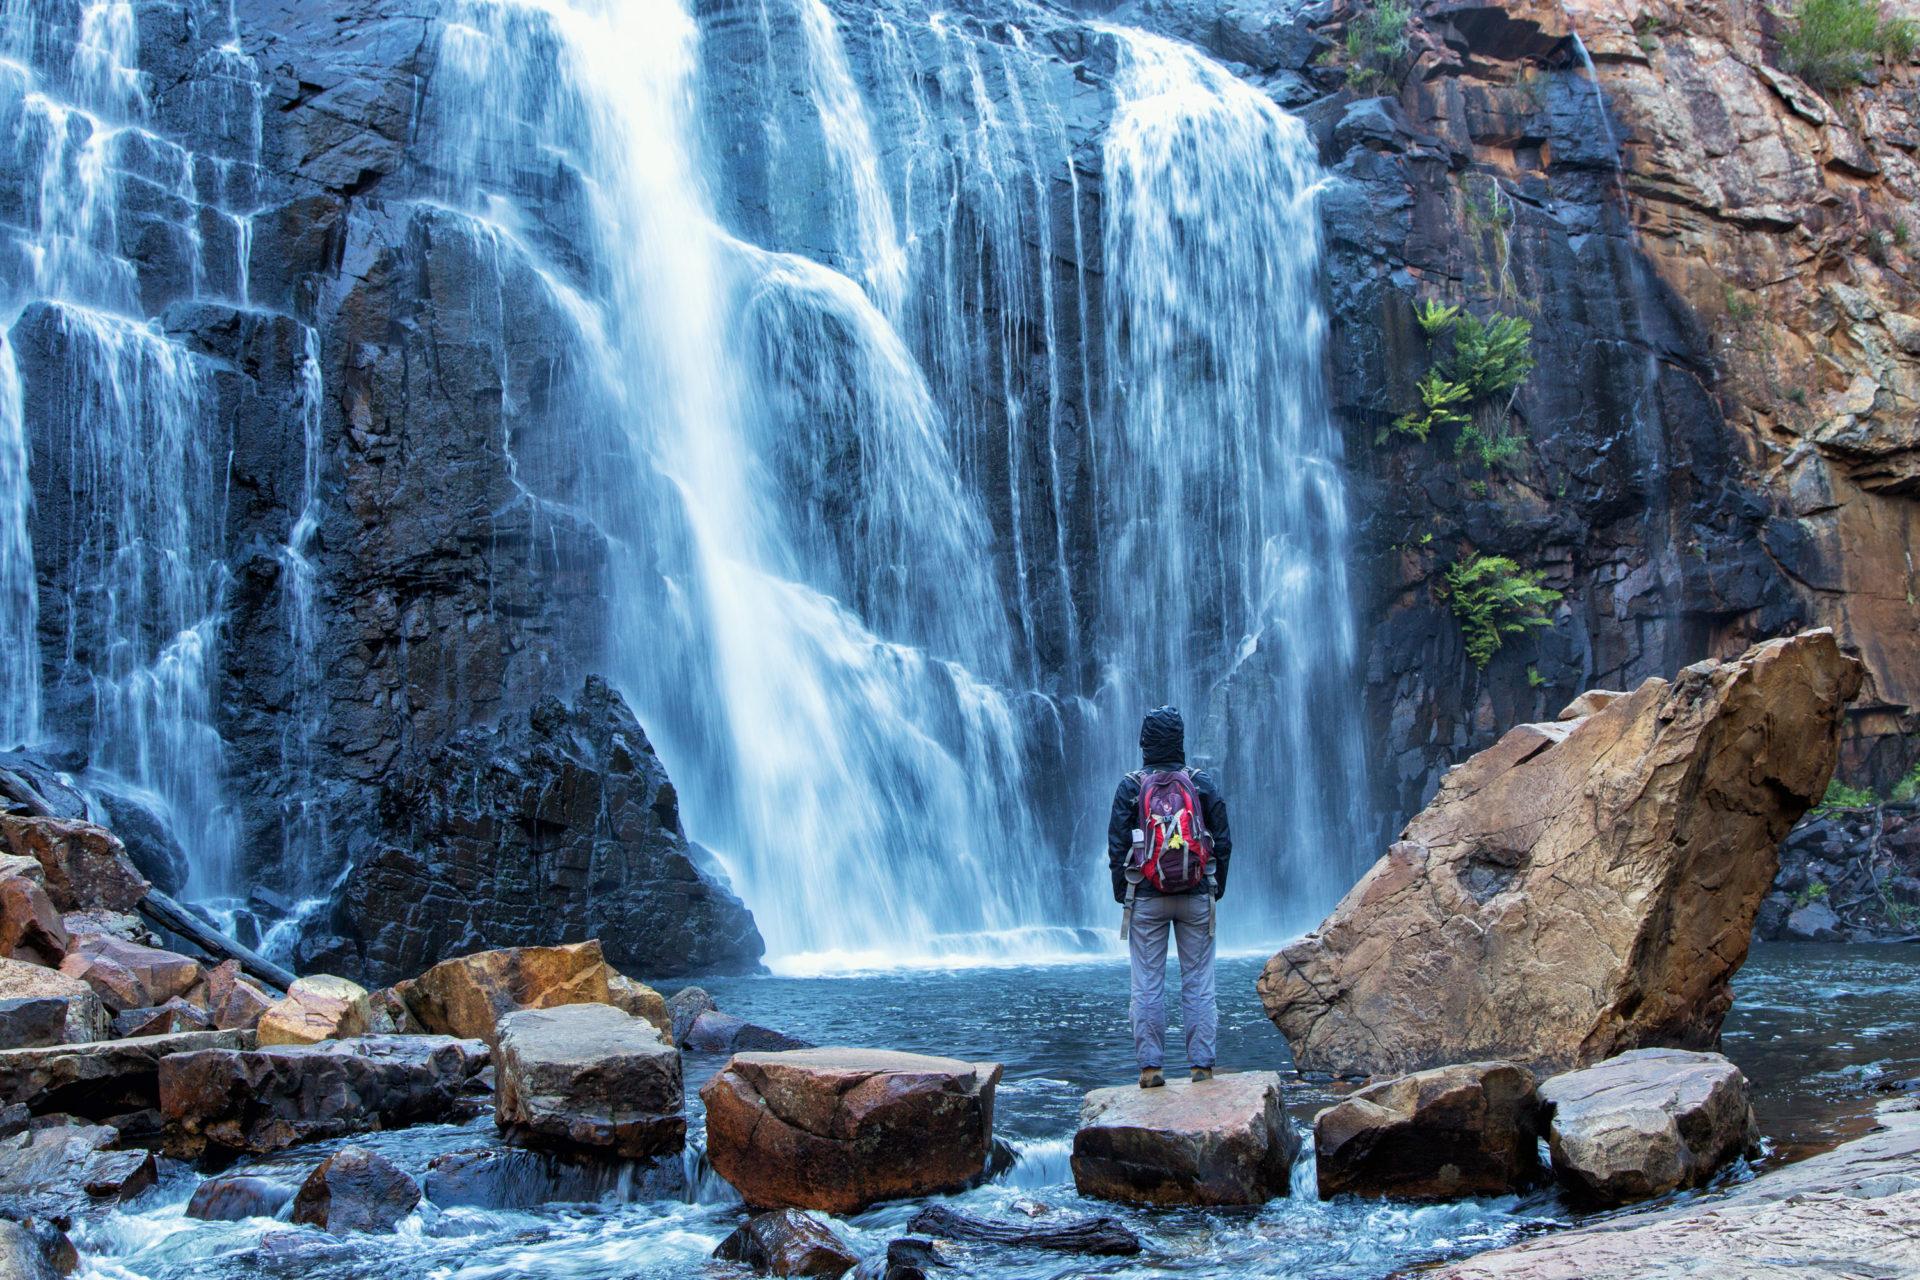 Person vor Wasserfall - Wandern in den Grampians, Australien